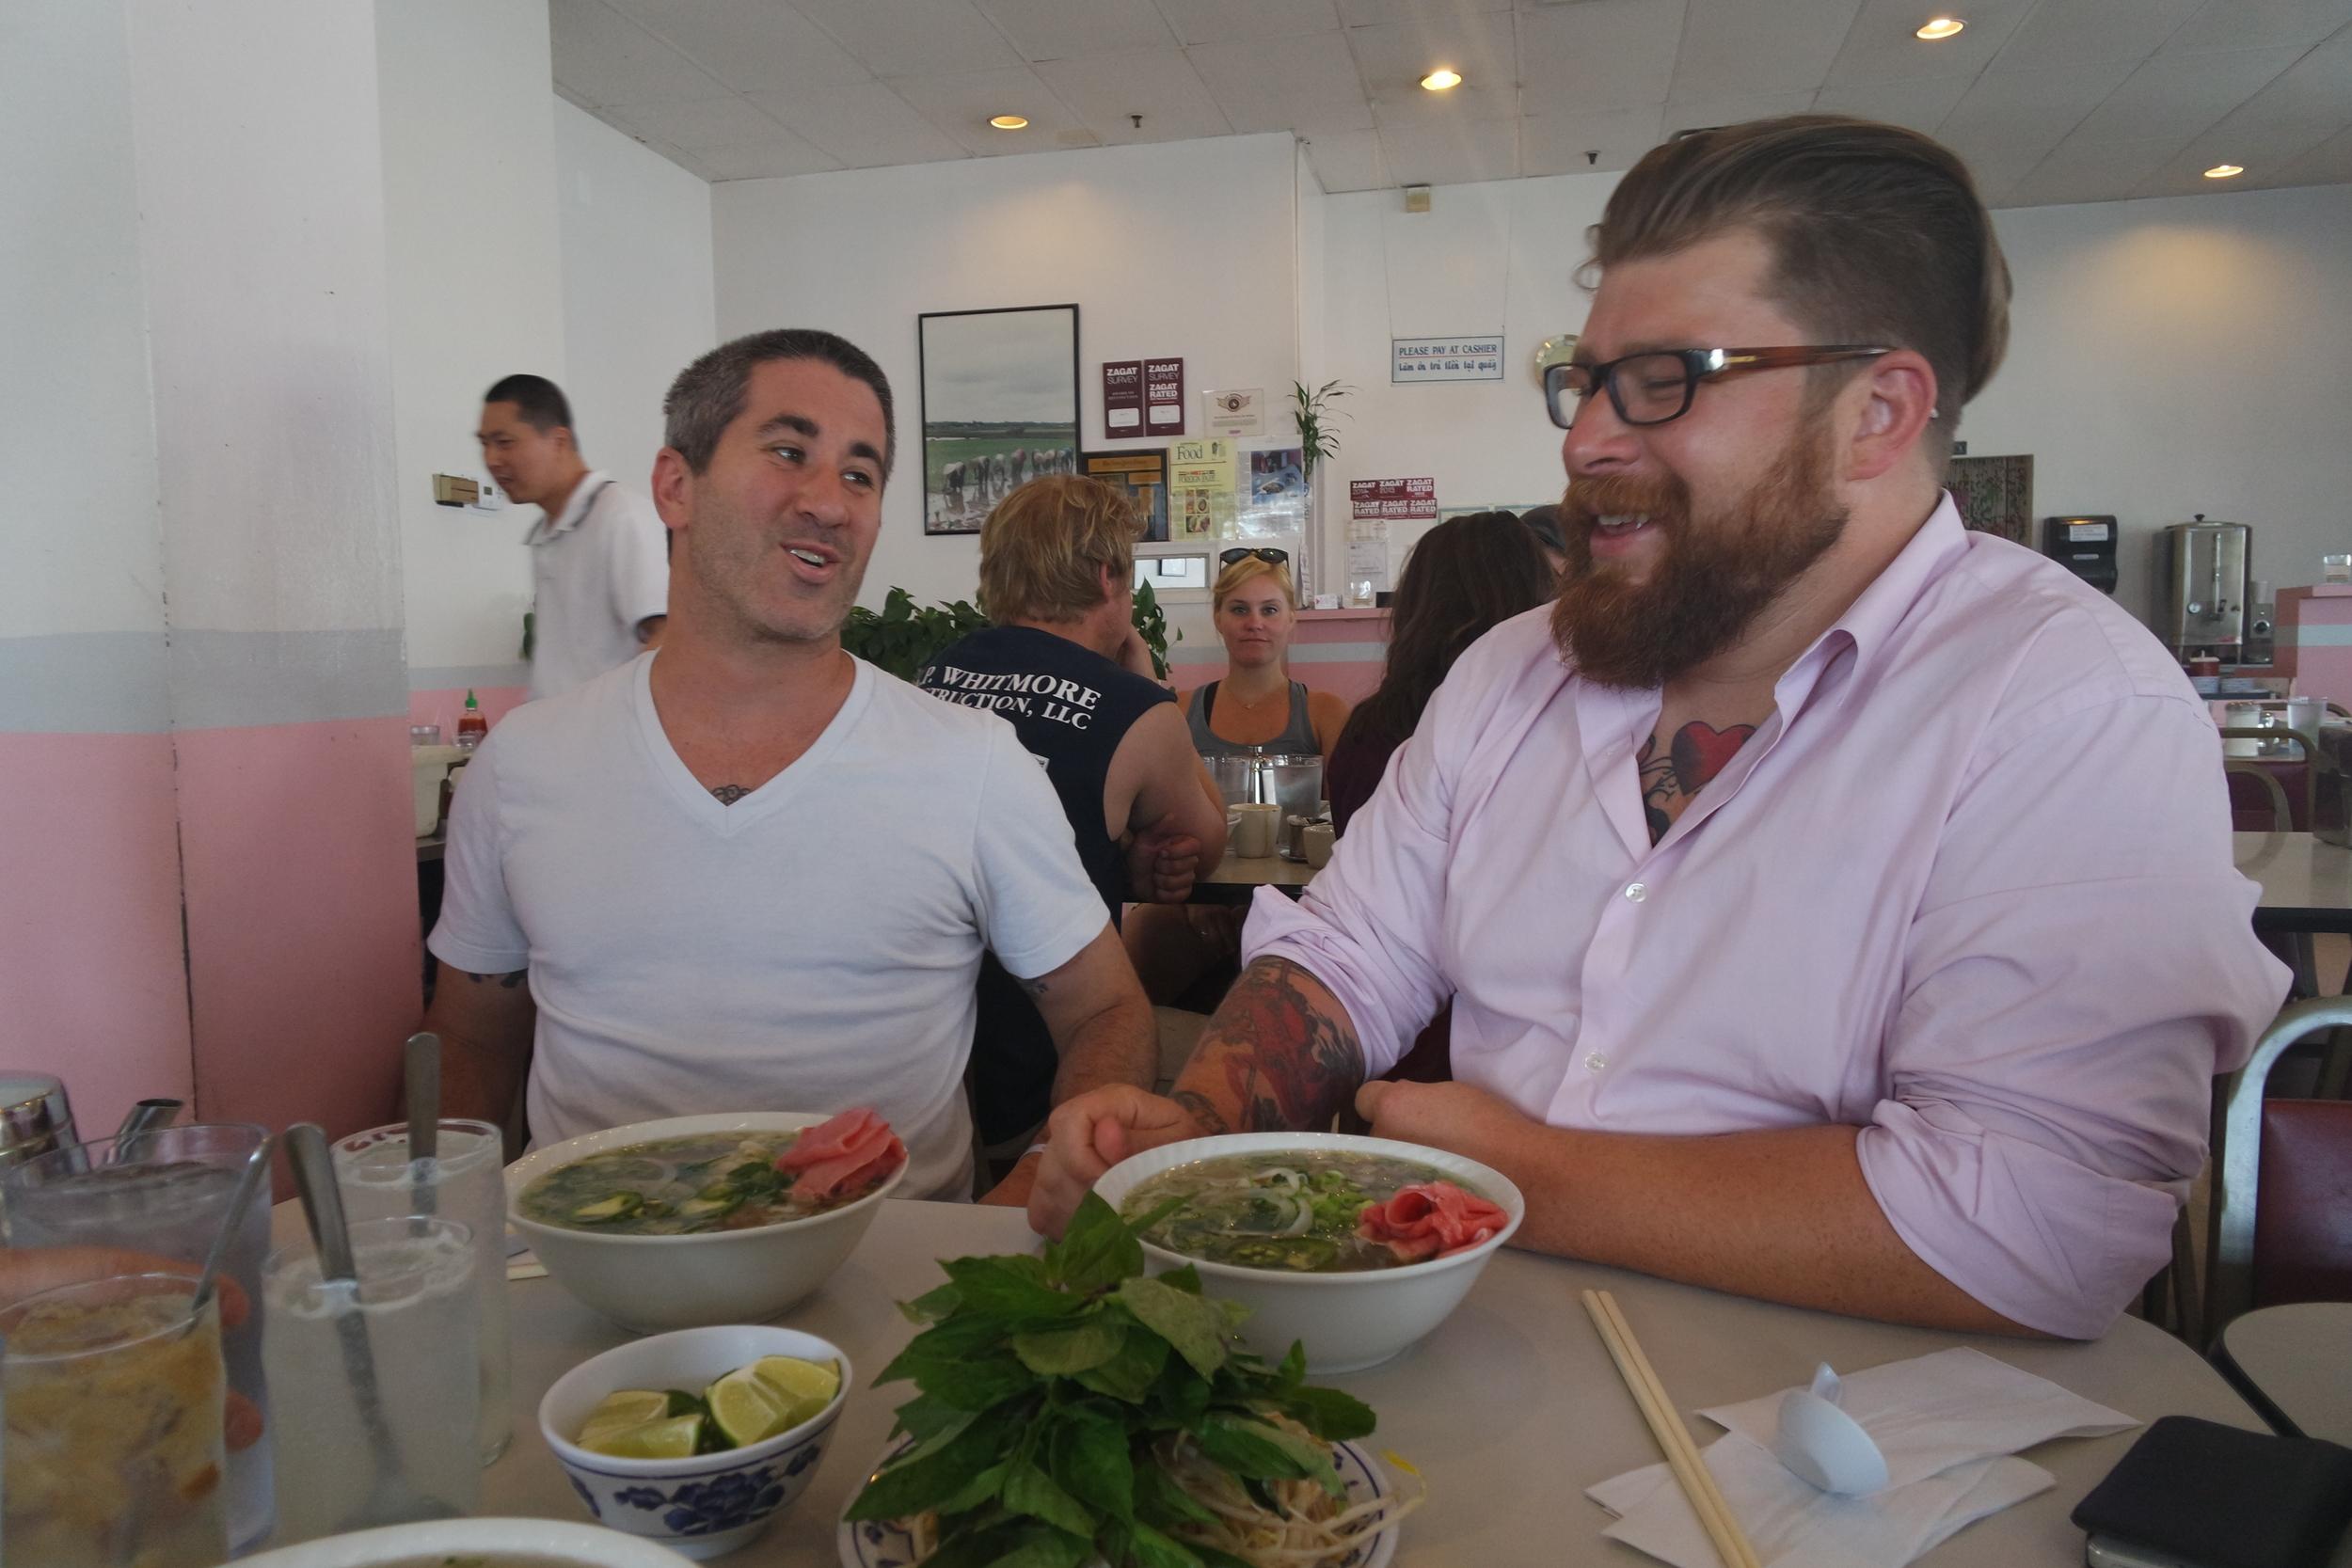 Chef Dads: Michael Solomonov & Jonathon Sawyer